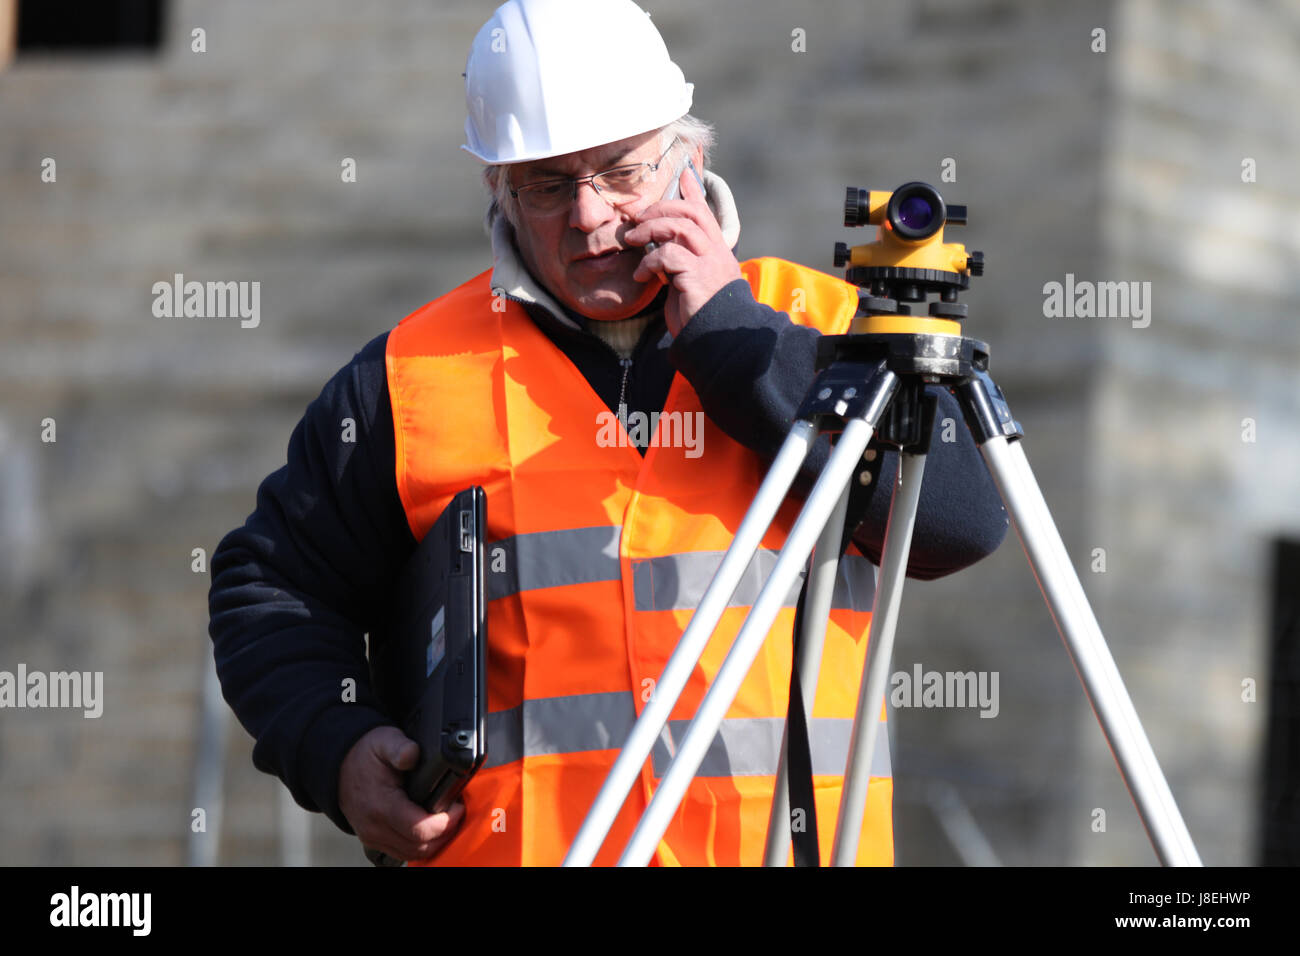 accuracy, cartography, supplier, contractor, builder, construction, lens, - Stock Image